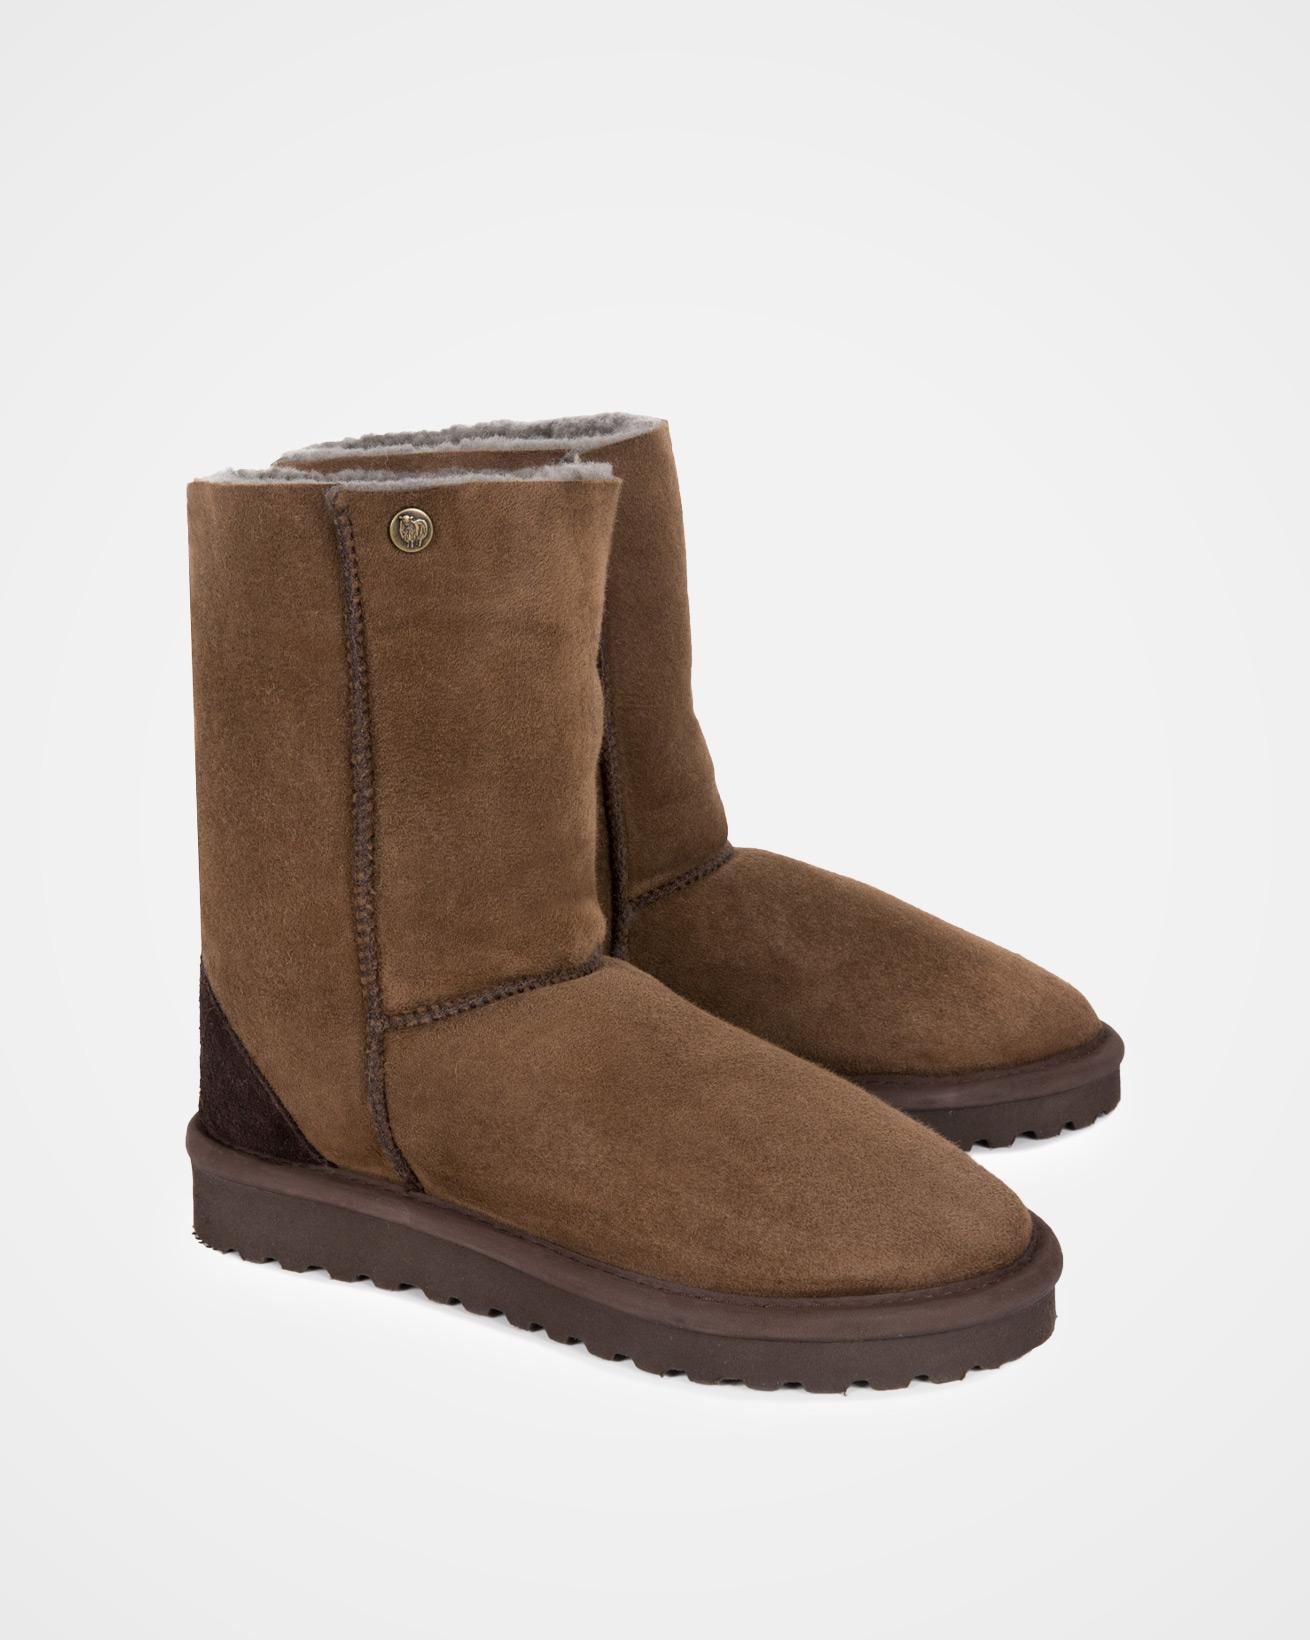 6614_original-celt-sheepskin-boots_khaki_pair.jpg